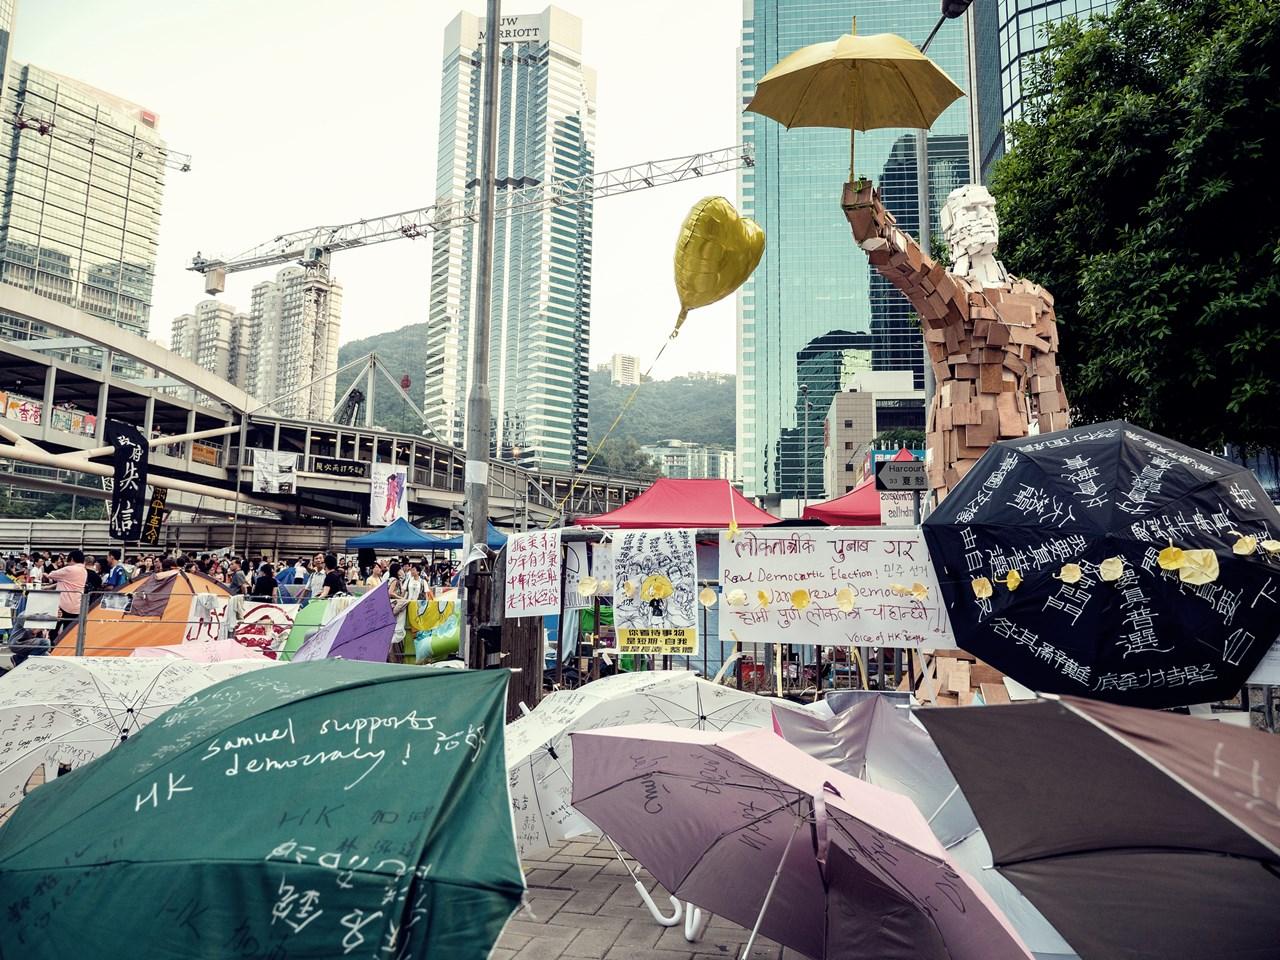 Revoluția Umbrelelor din 2014, Hong Kong